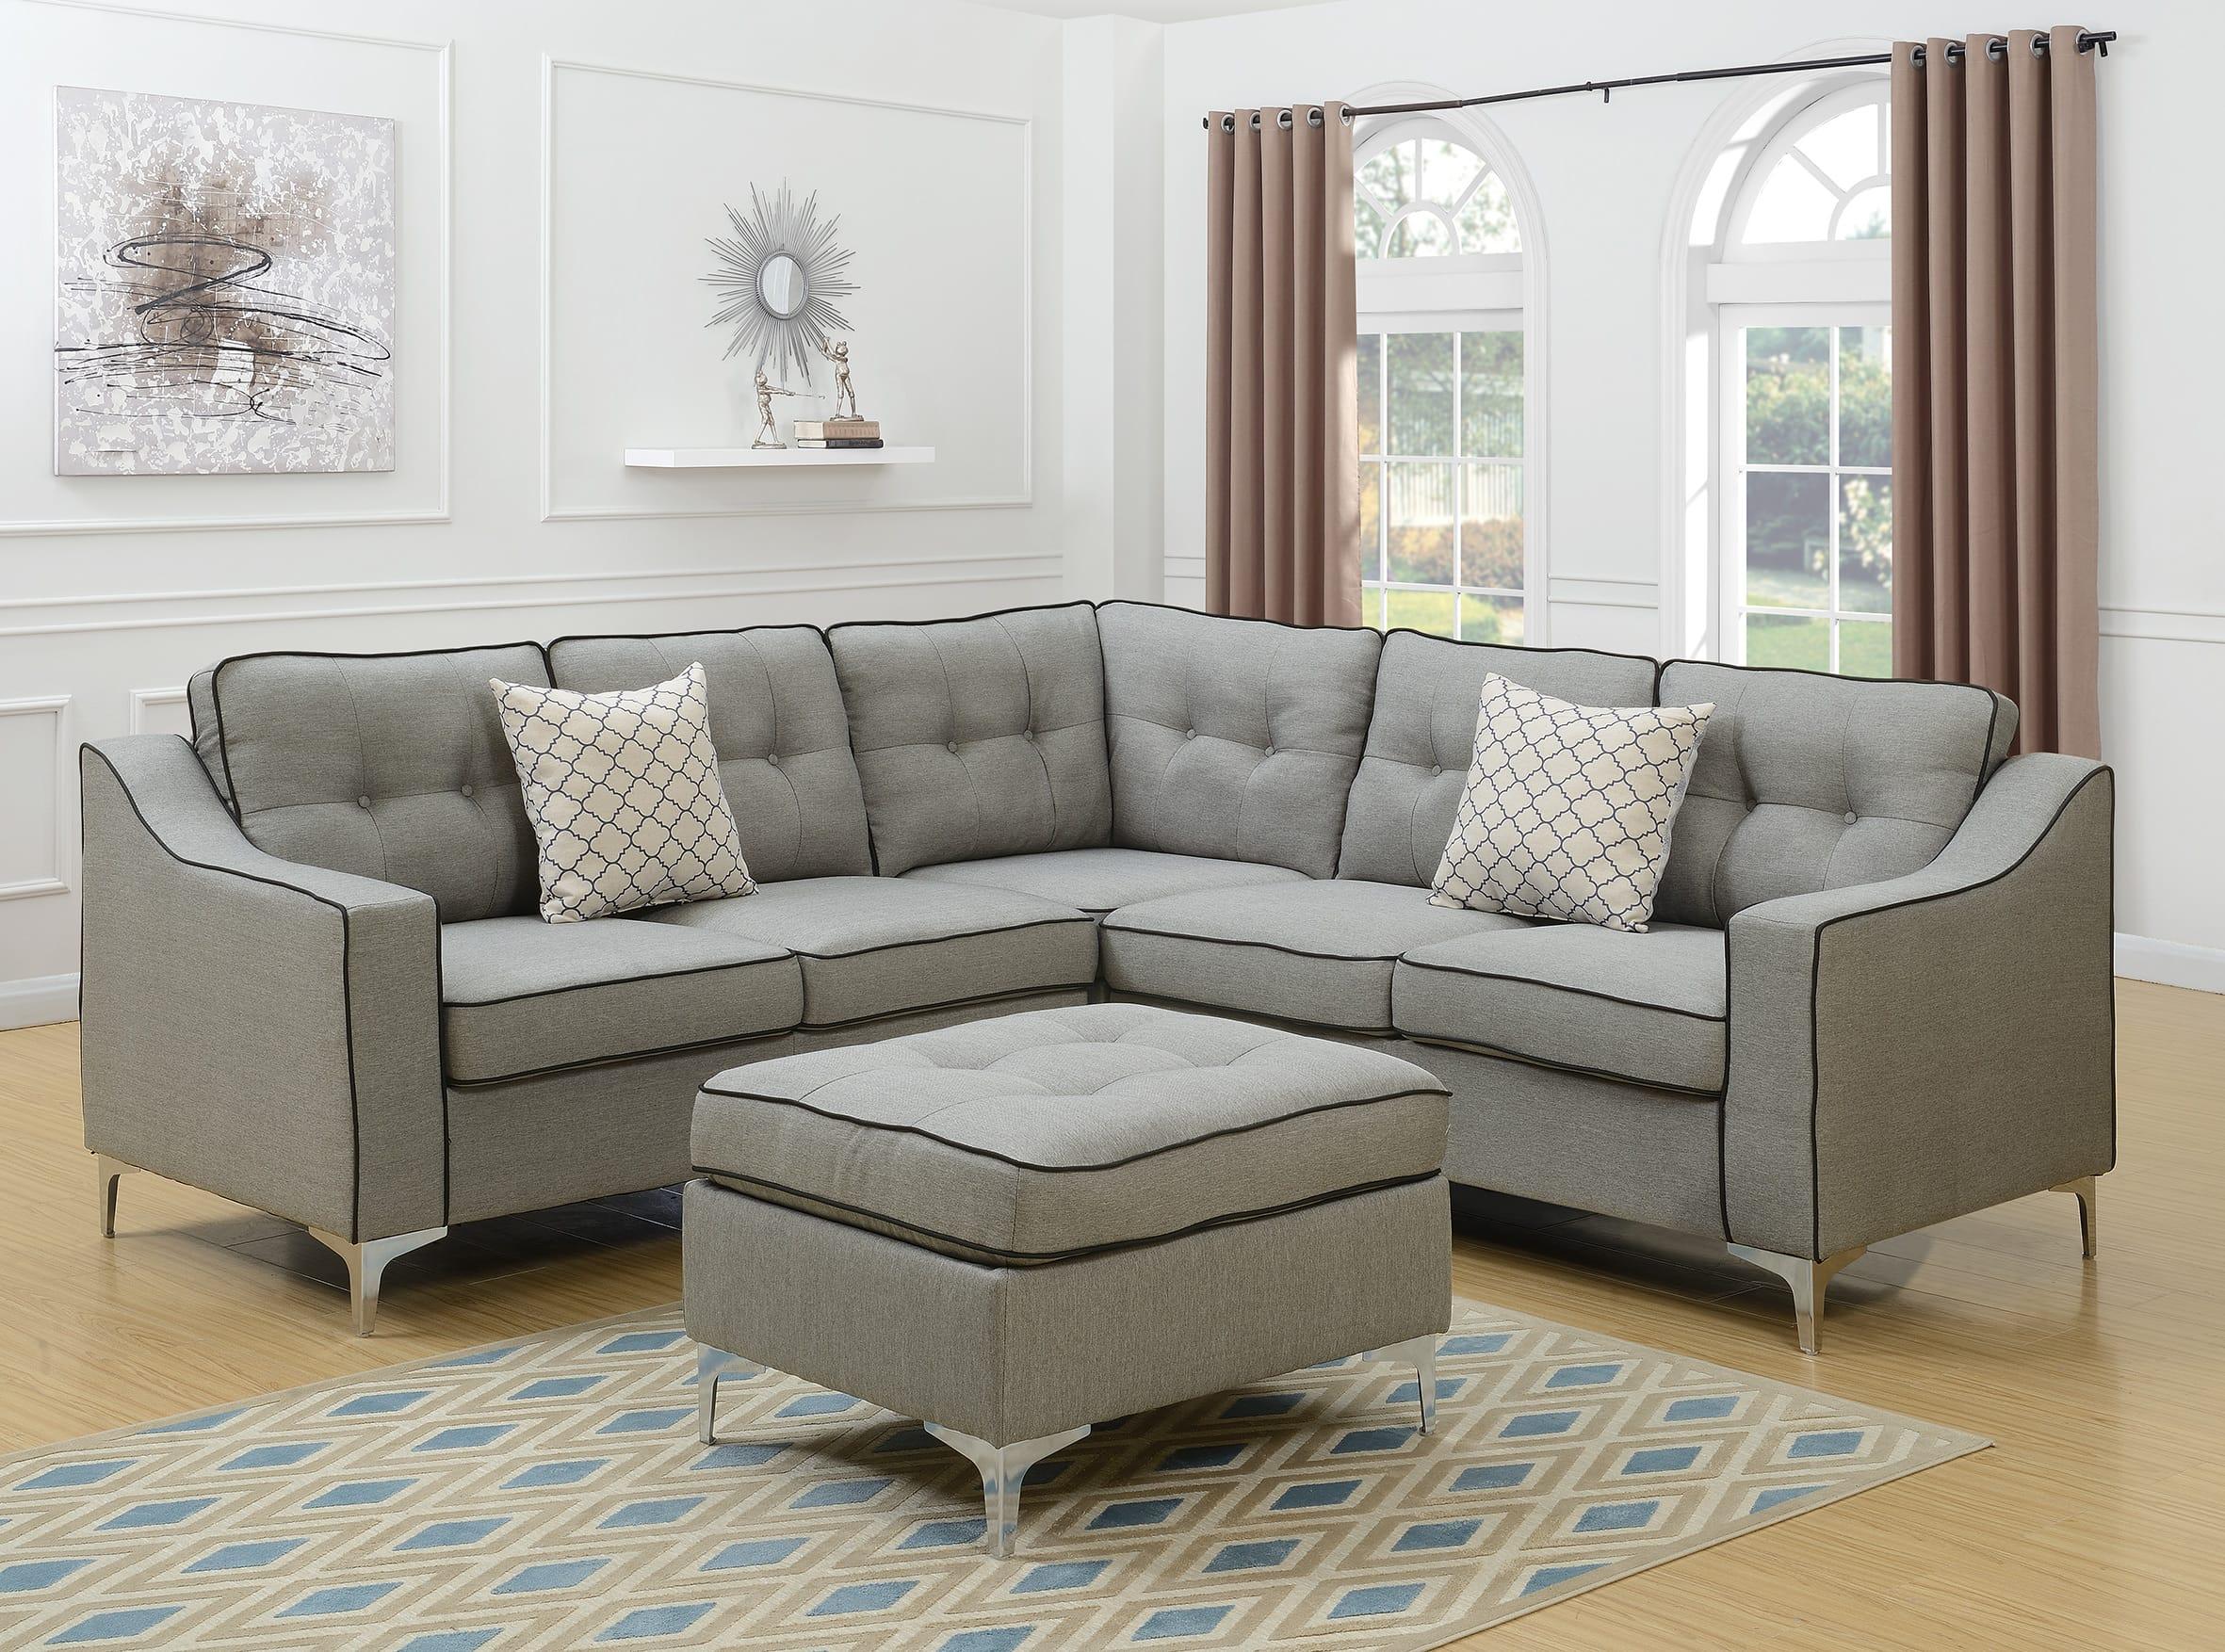 F6998 Light Gray 4 Pcs Sectional Sofa Set by Poundex